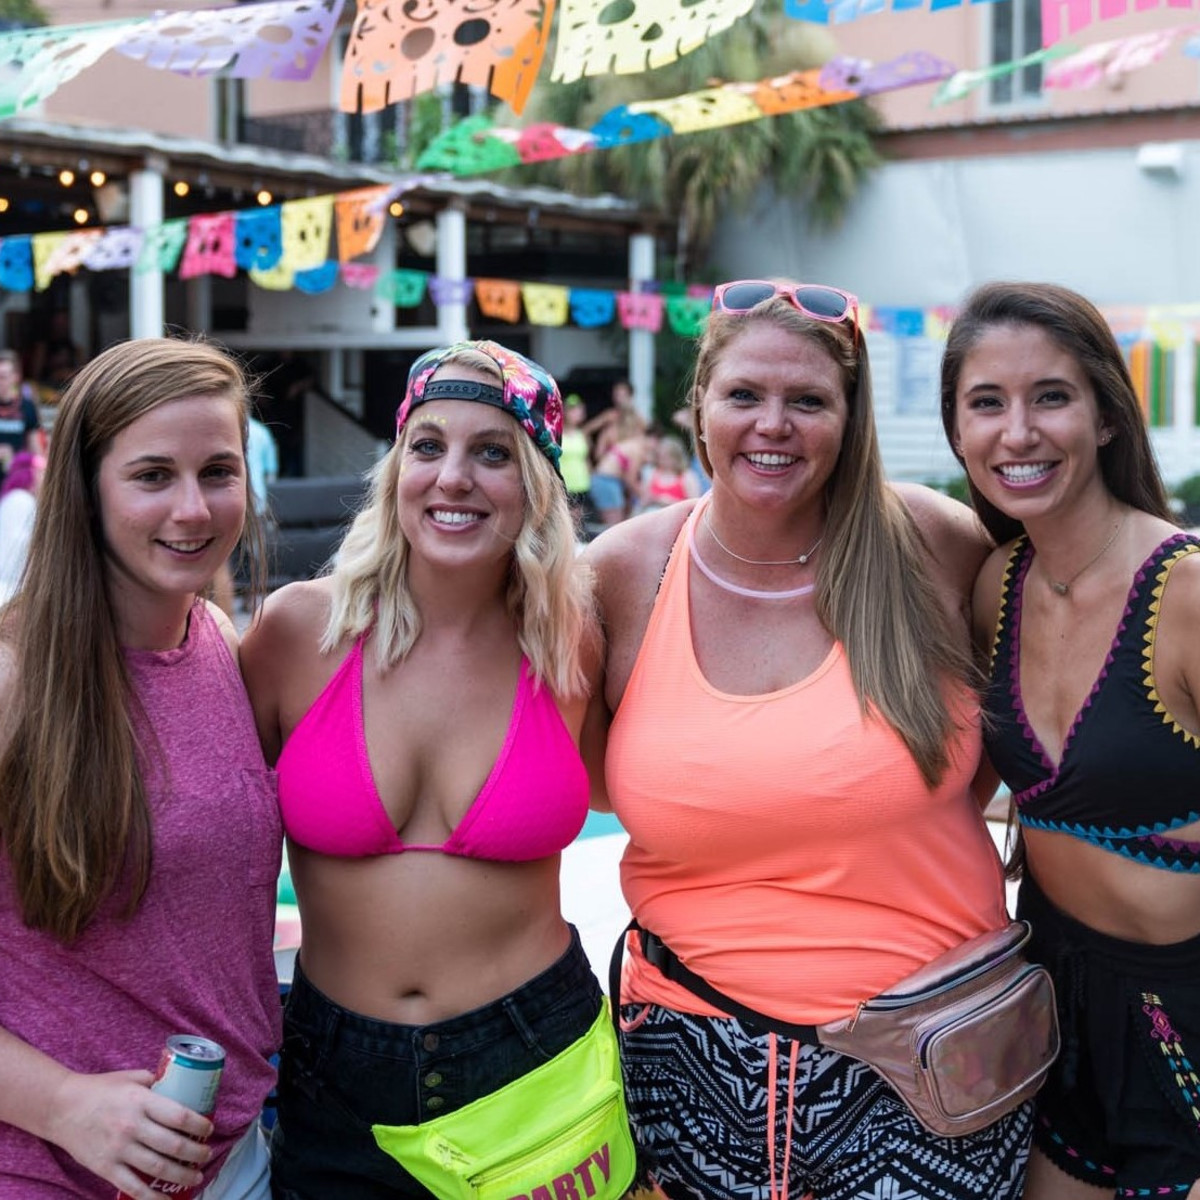 Kristi Leonard, Holley Caldwell, Stephanie Zorn, Kara Kirkby, BvB pool party